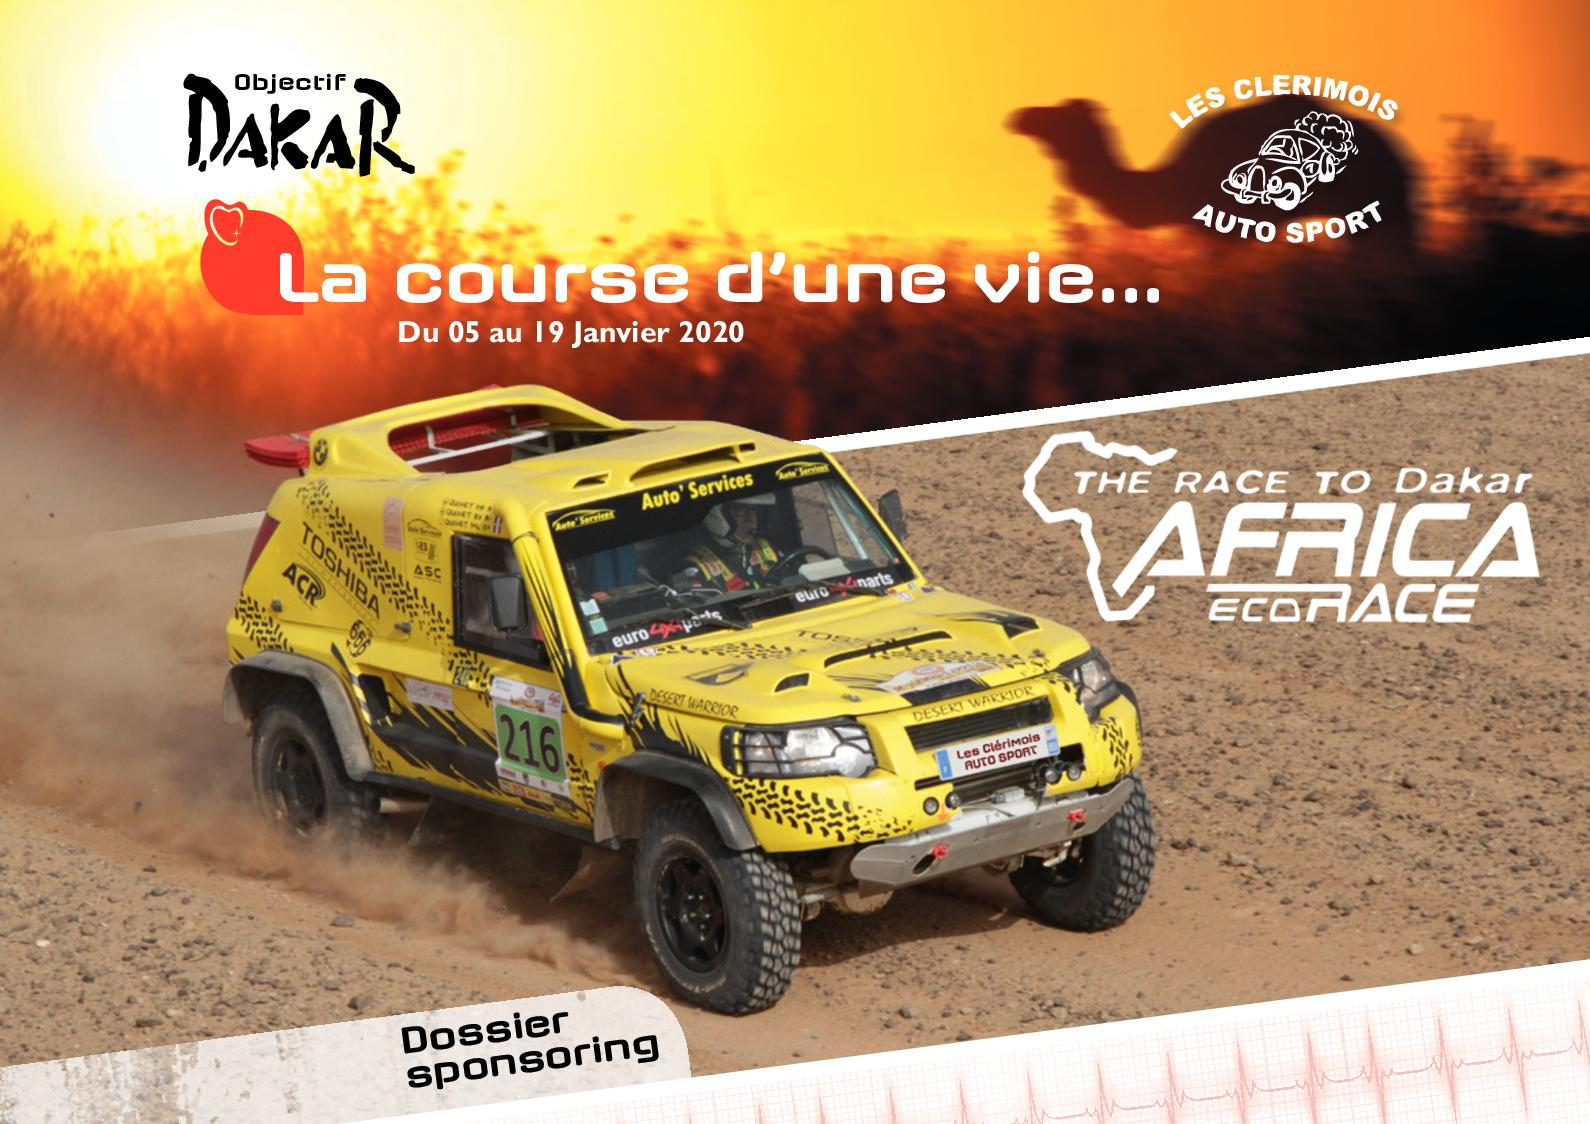 Dakar / Africa Eco Race 2020 Quinet